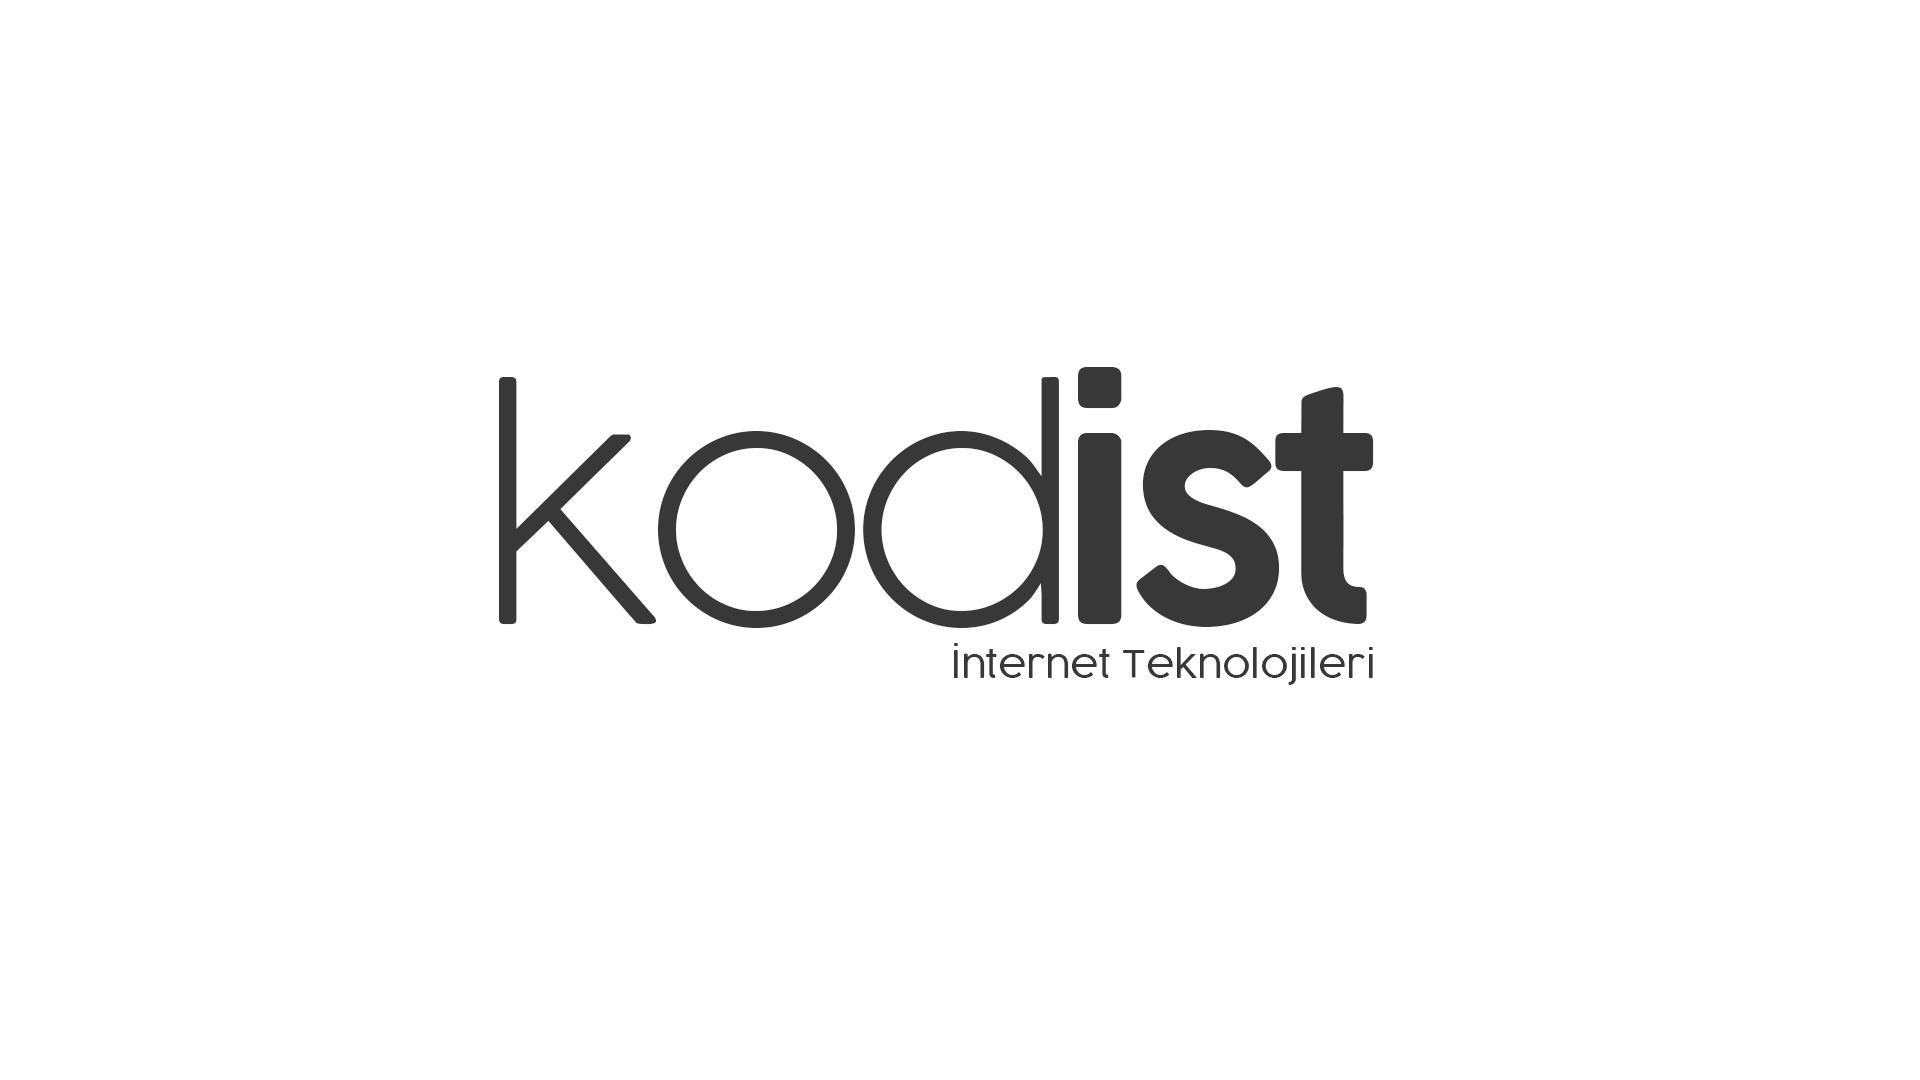 Kodist İnternet Teknolojileri